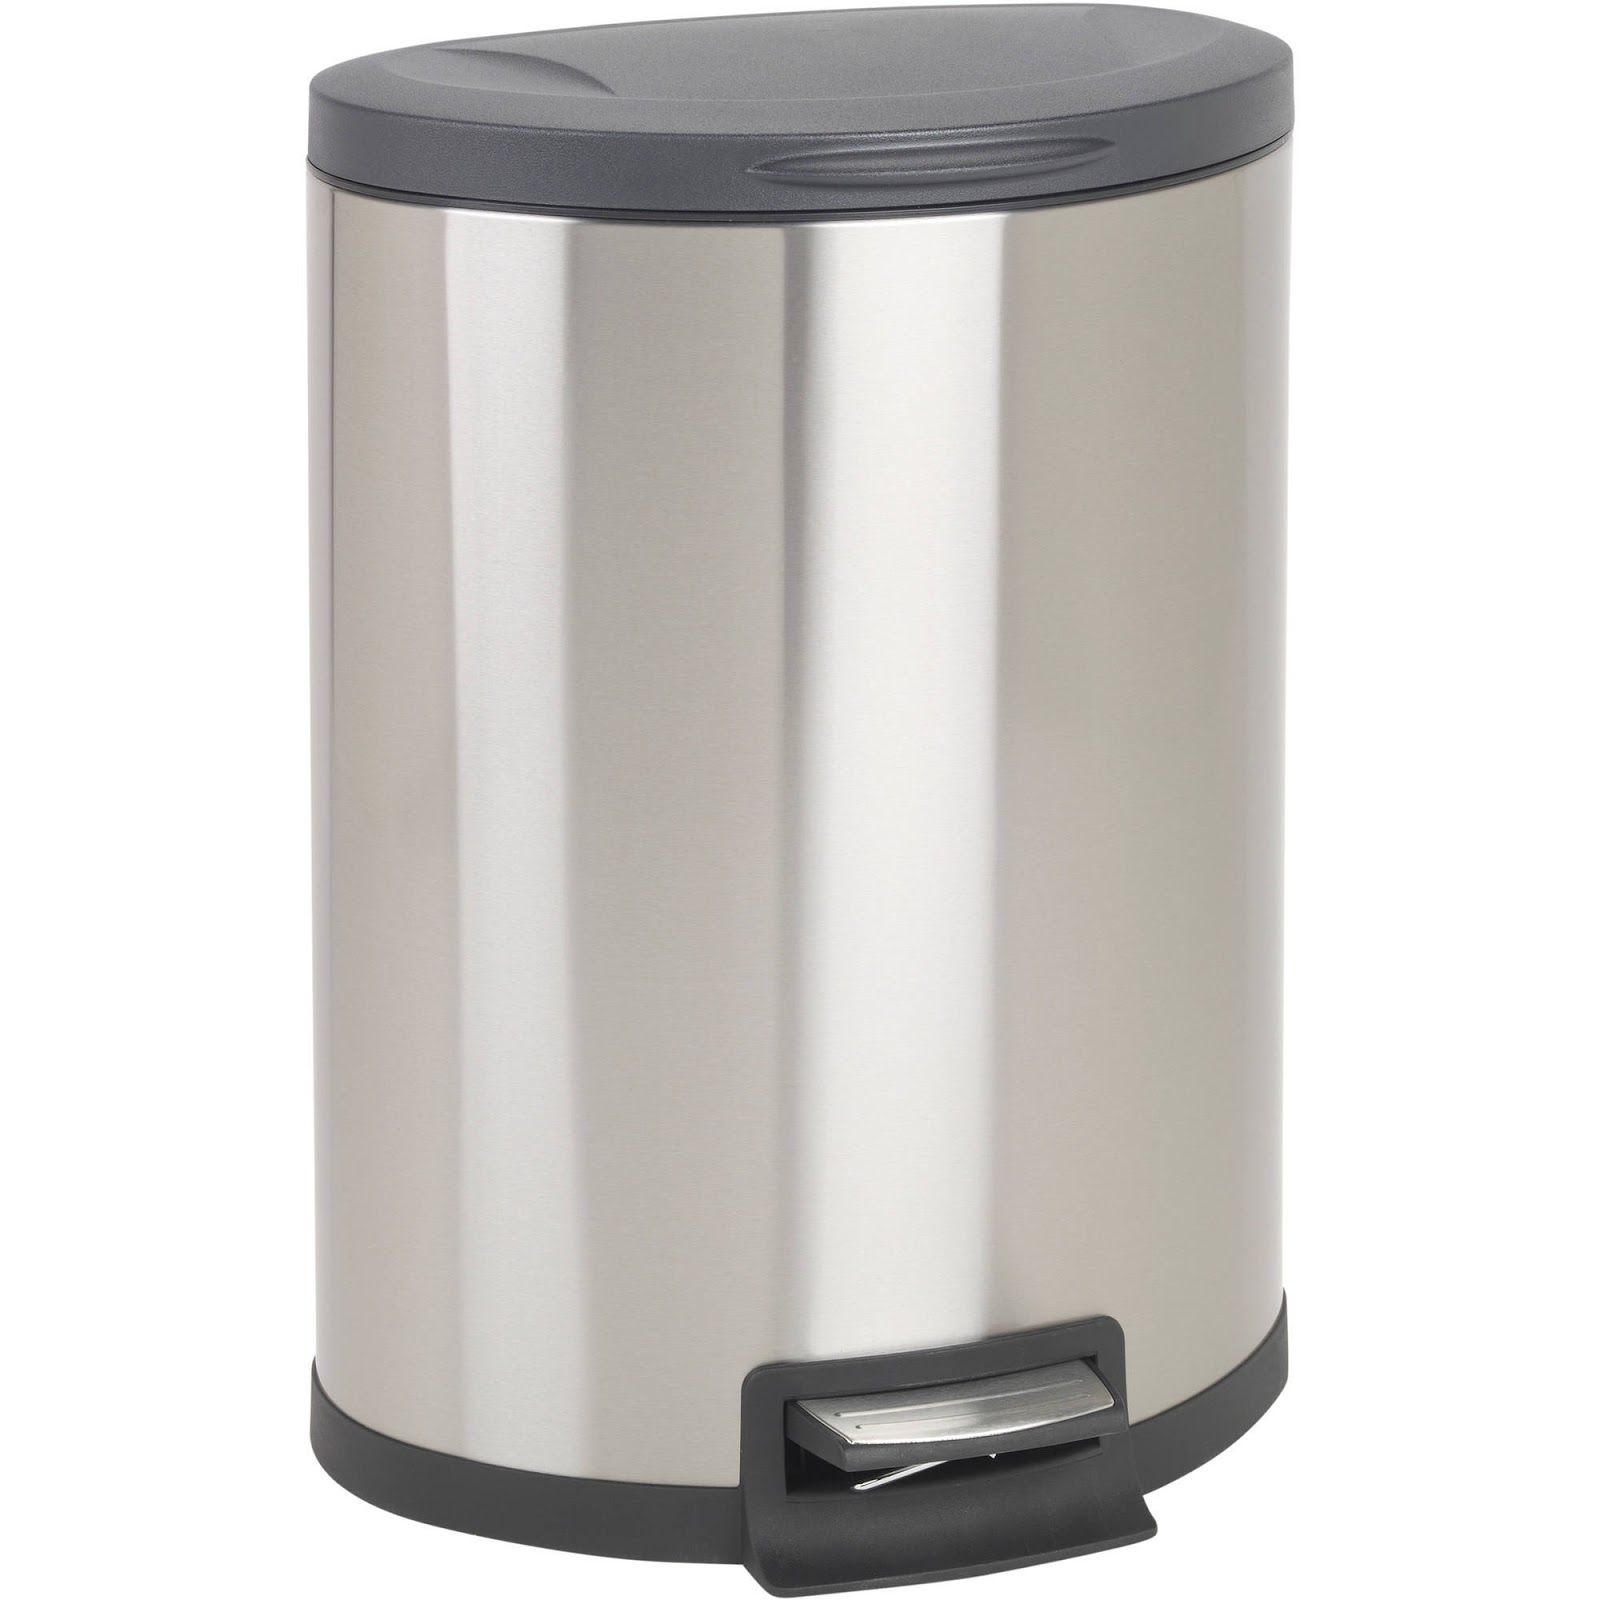 kitchen garbage cans walmart reviews & guide - kitchen remodel